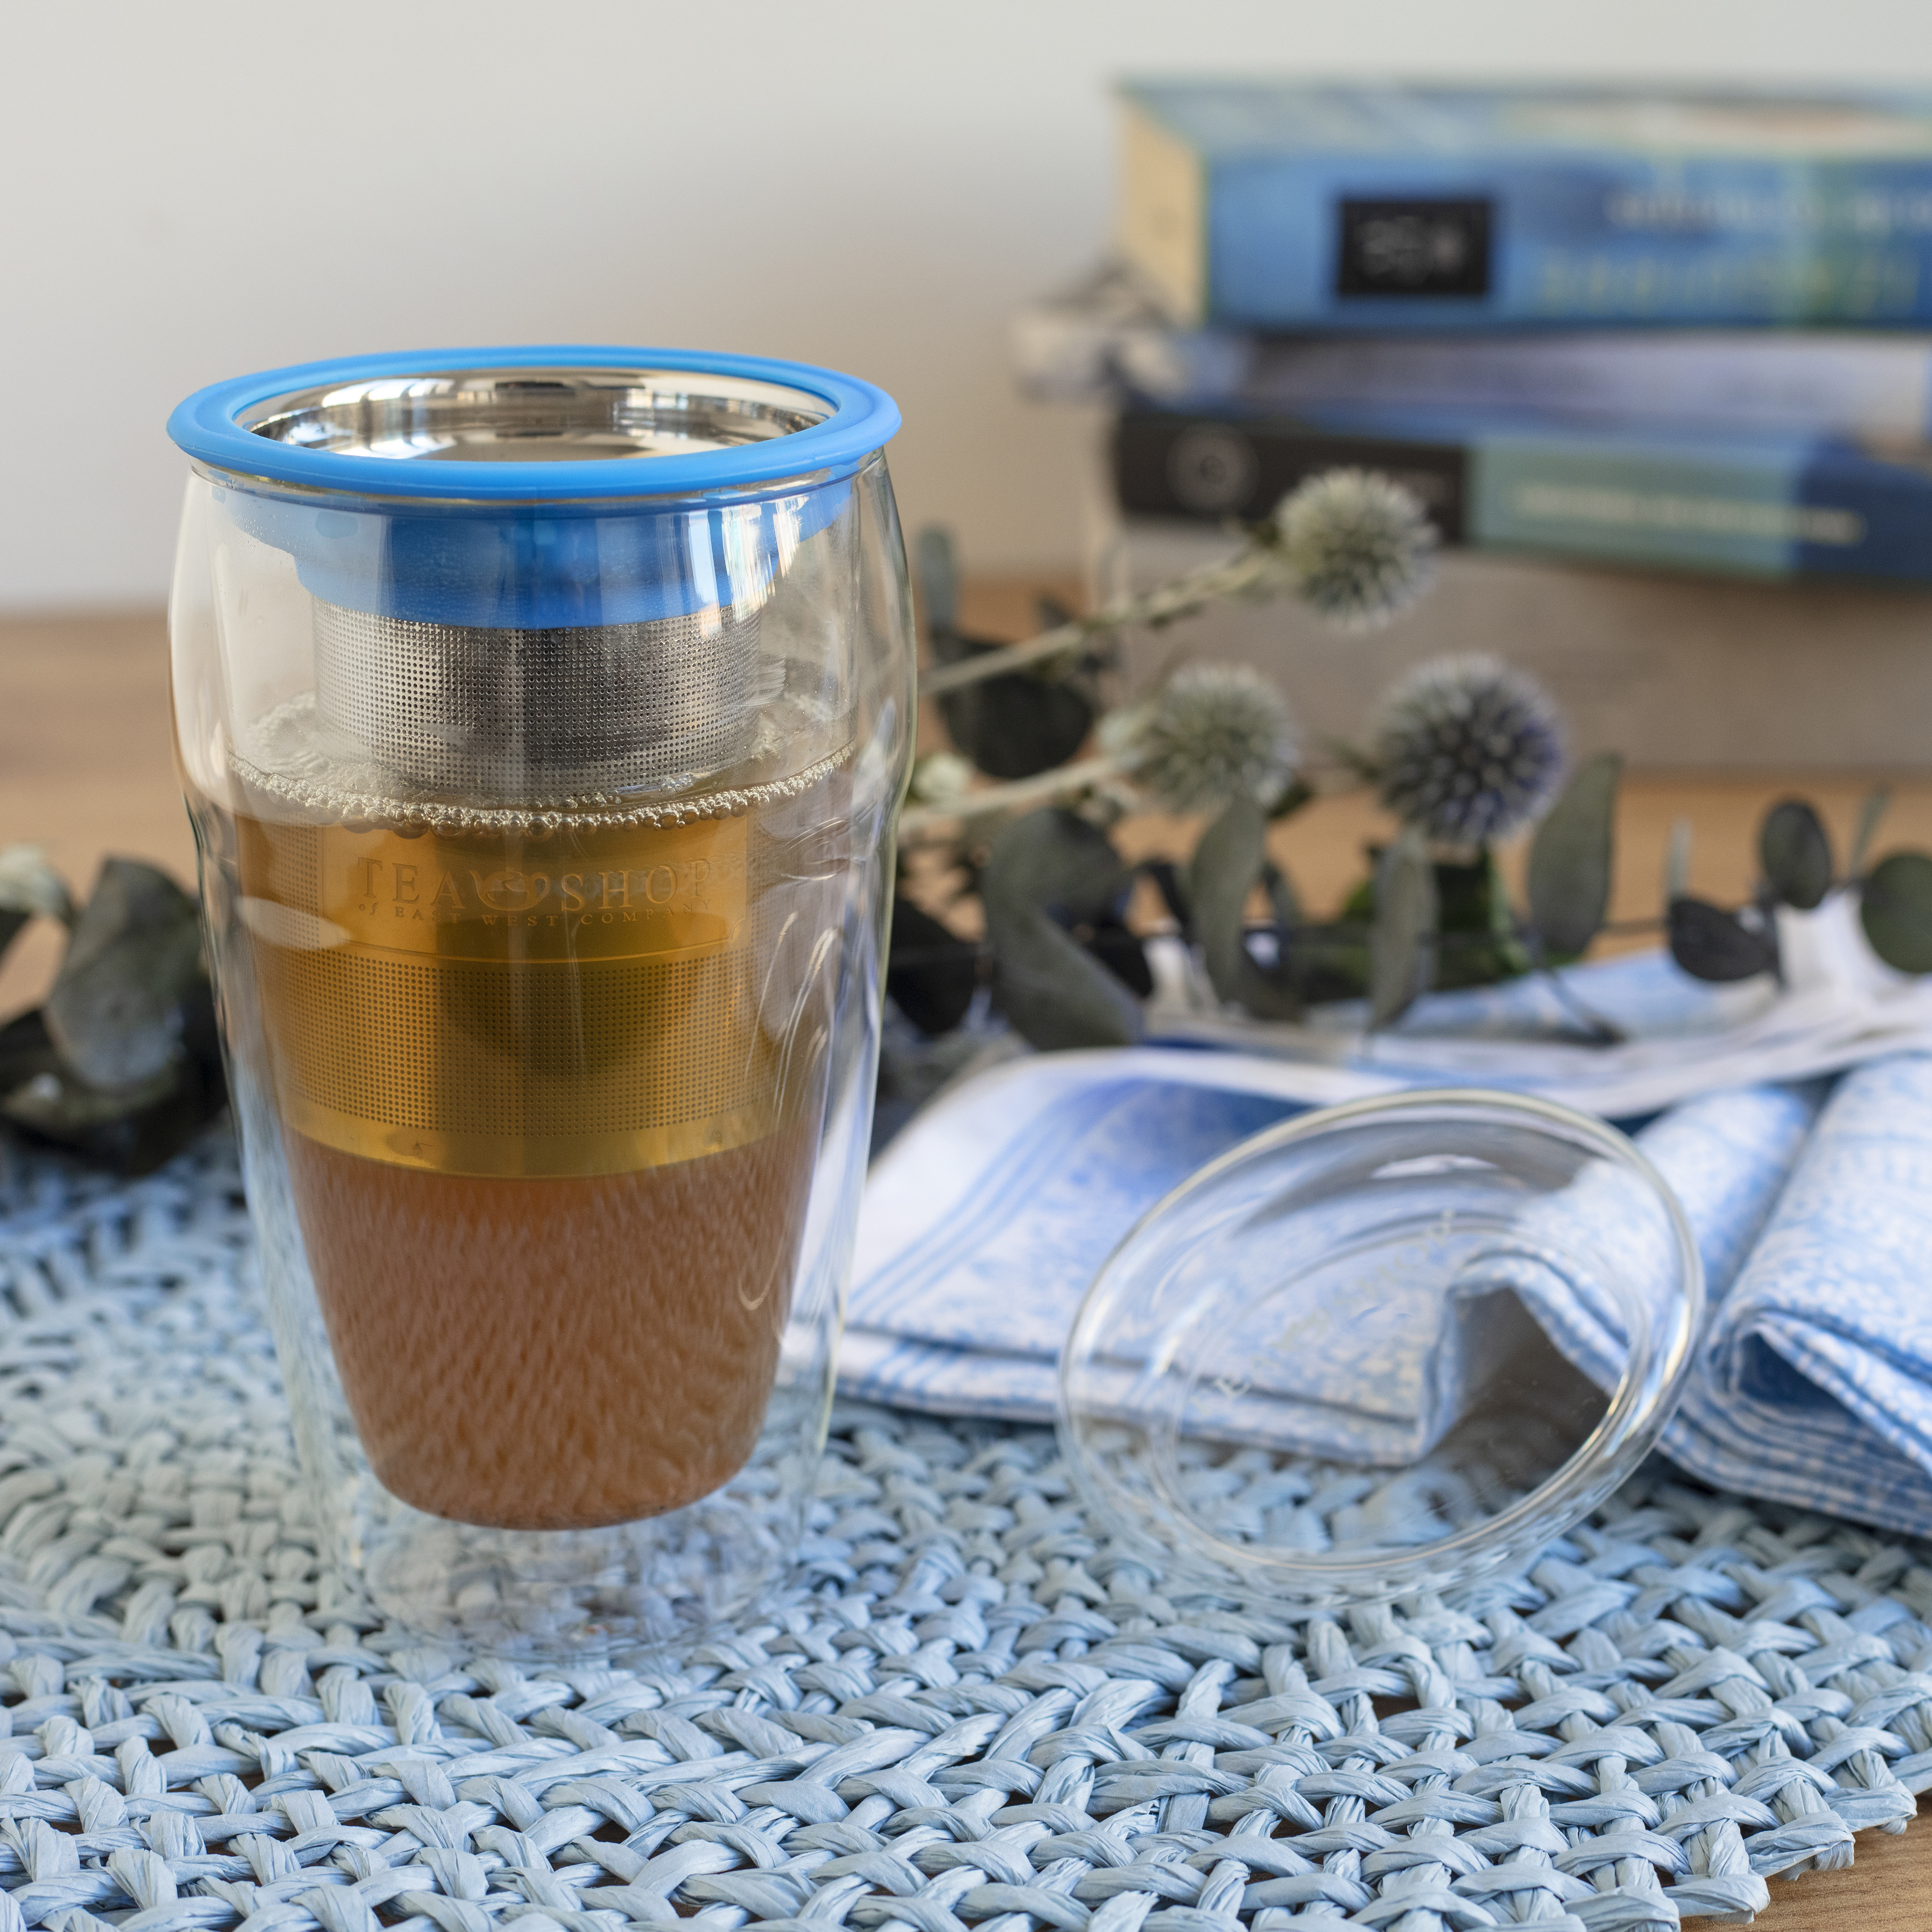 All in One Jumbo Blue Sea. Tea Shop - Item2